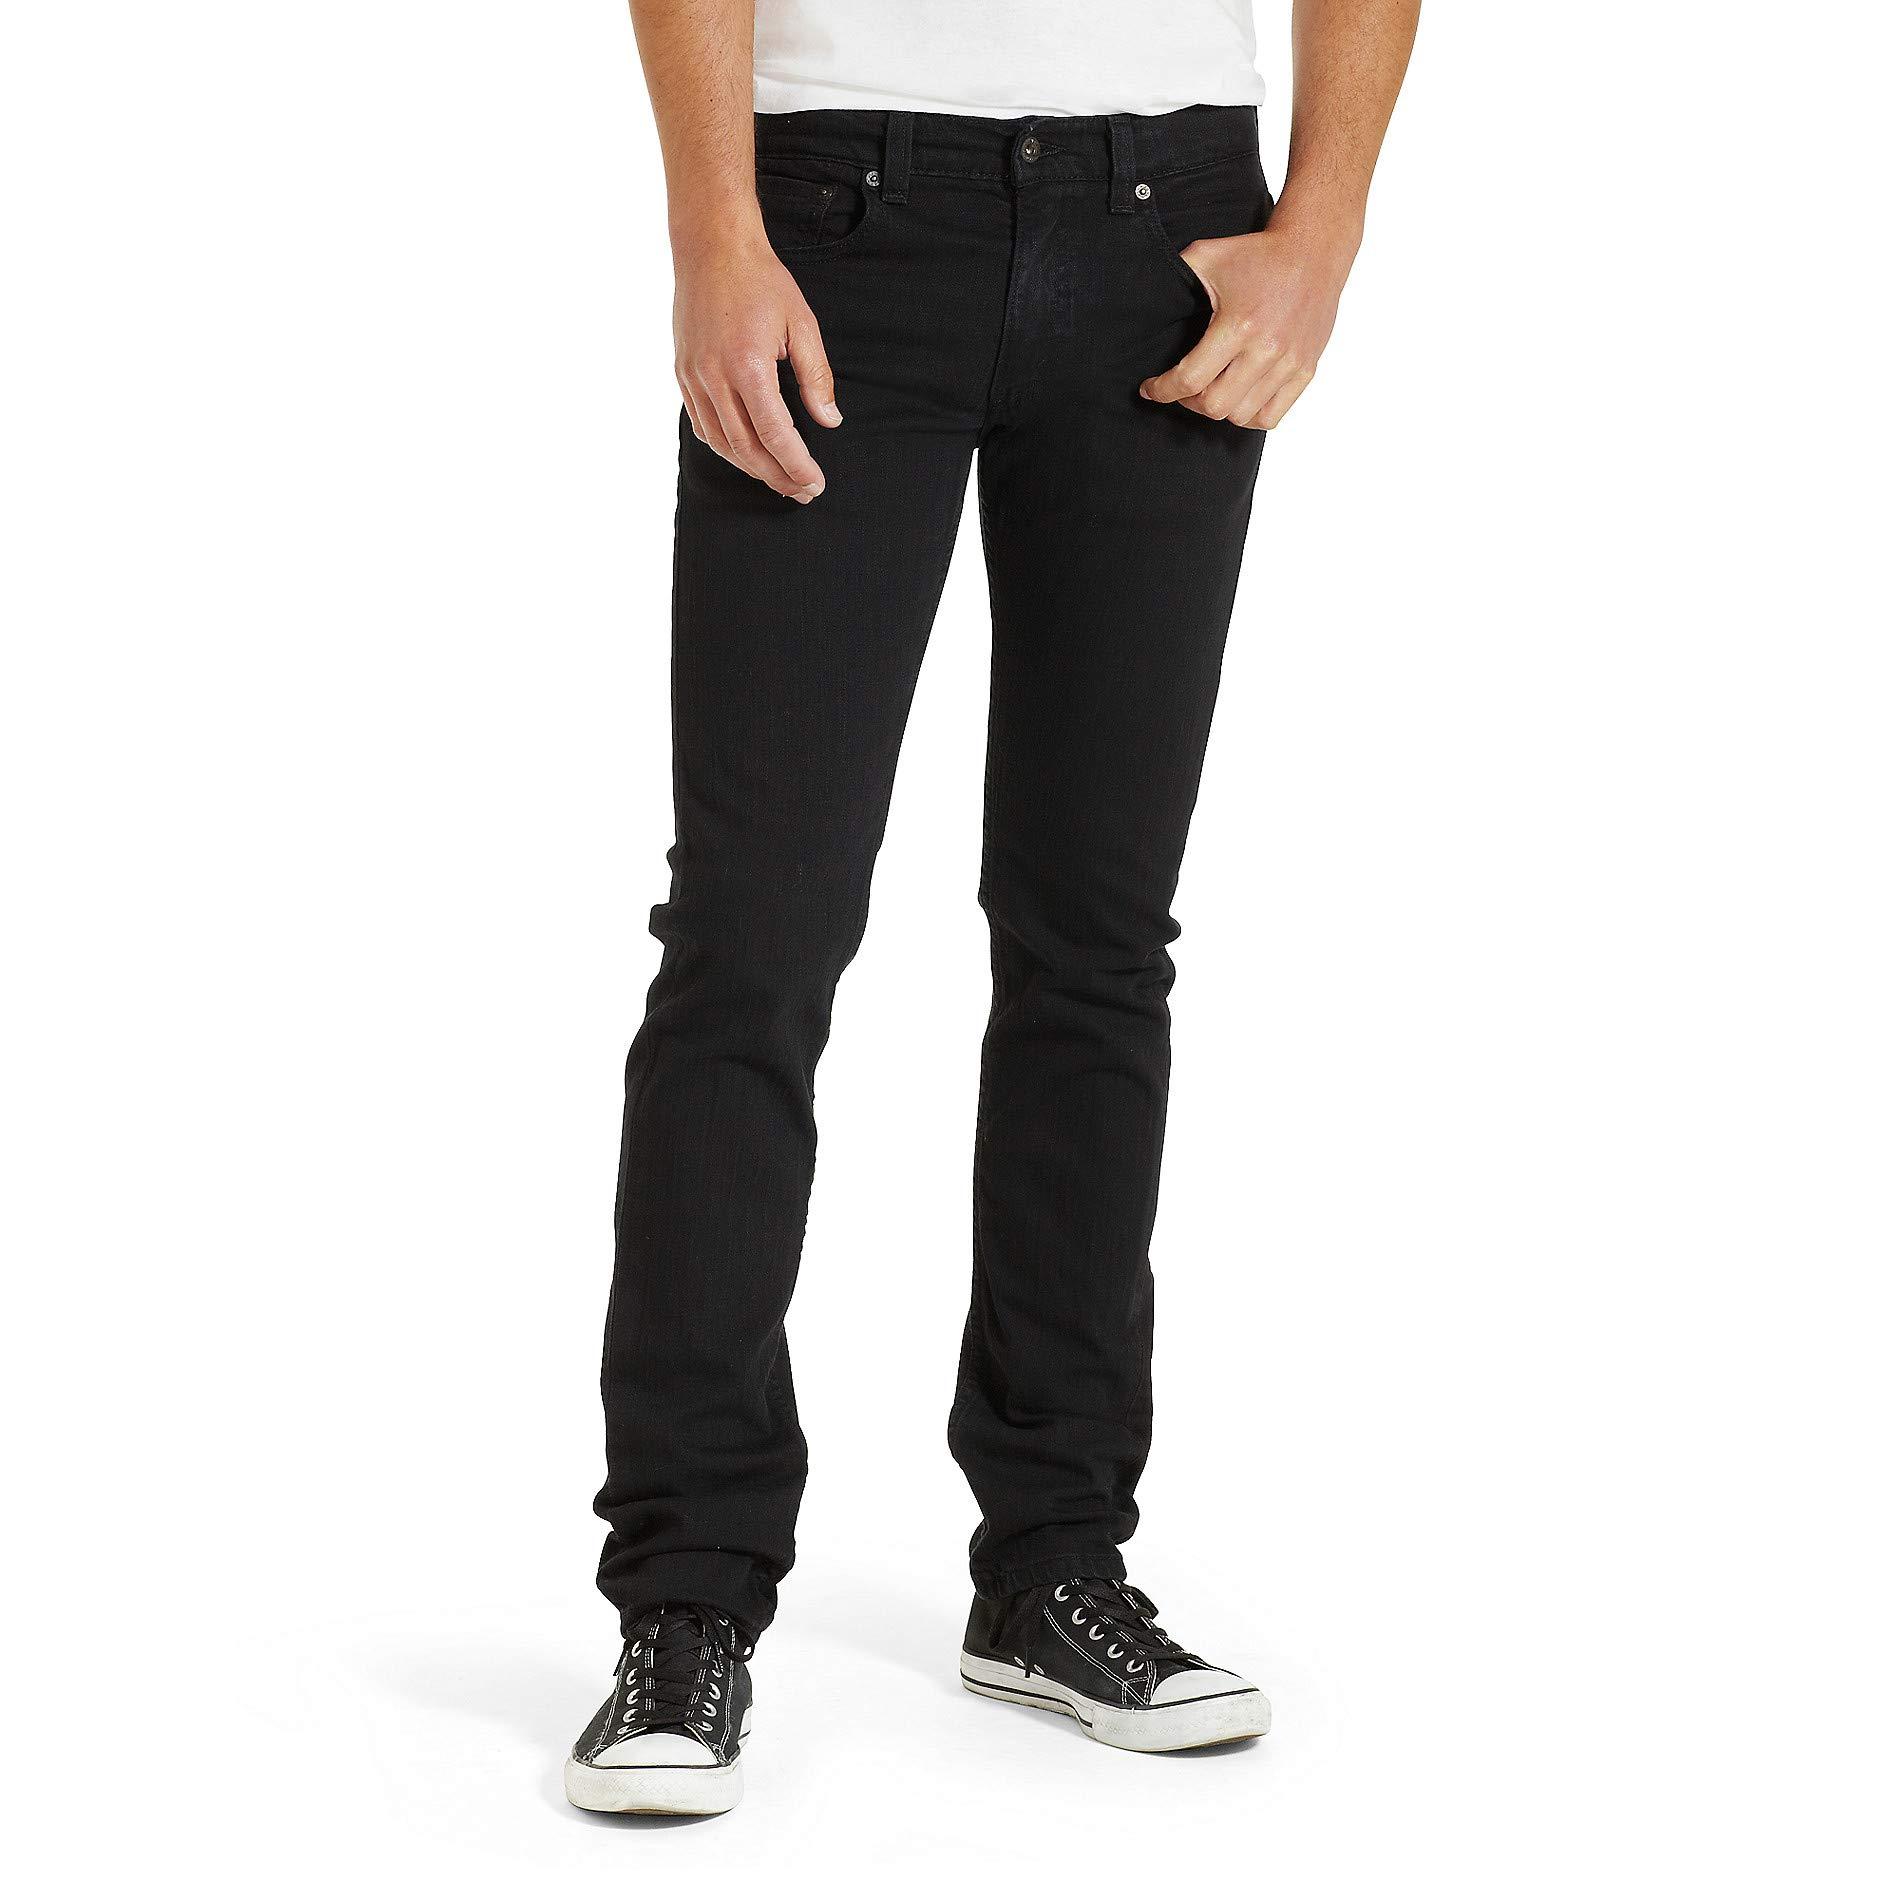 Levi's Men's 511 Slim Fit Jean, Black - Stretch, 32W x 32L by Levi's